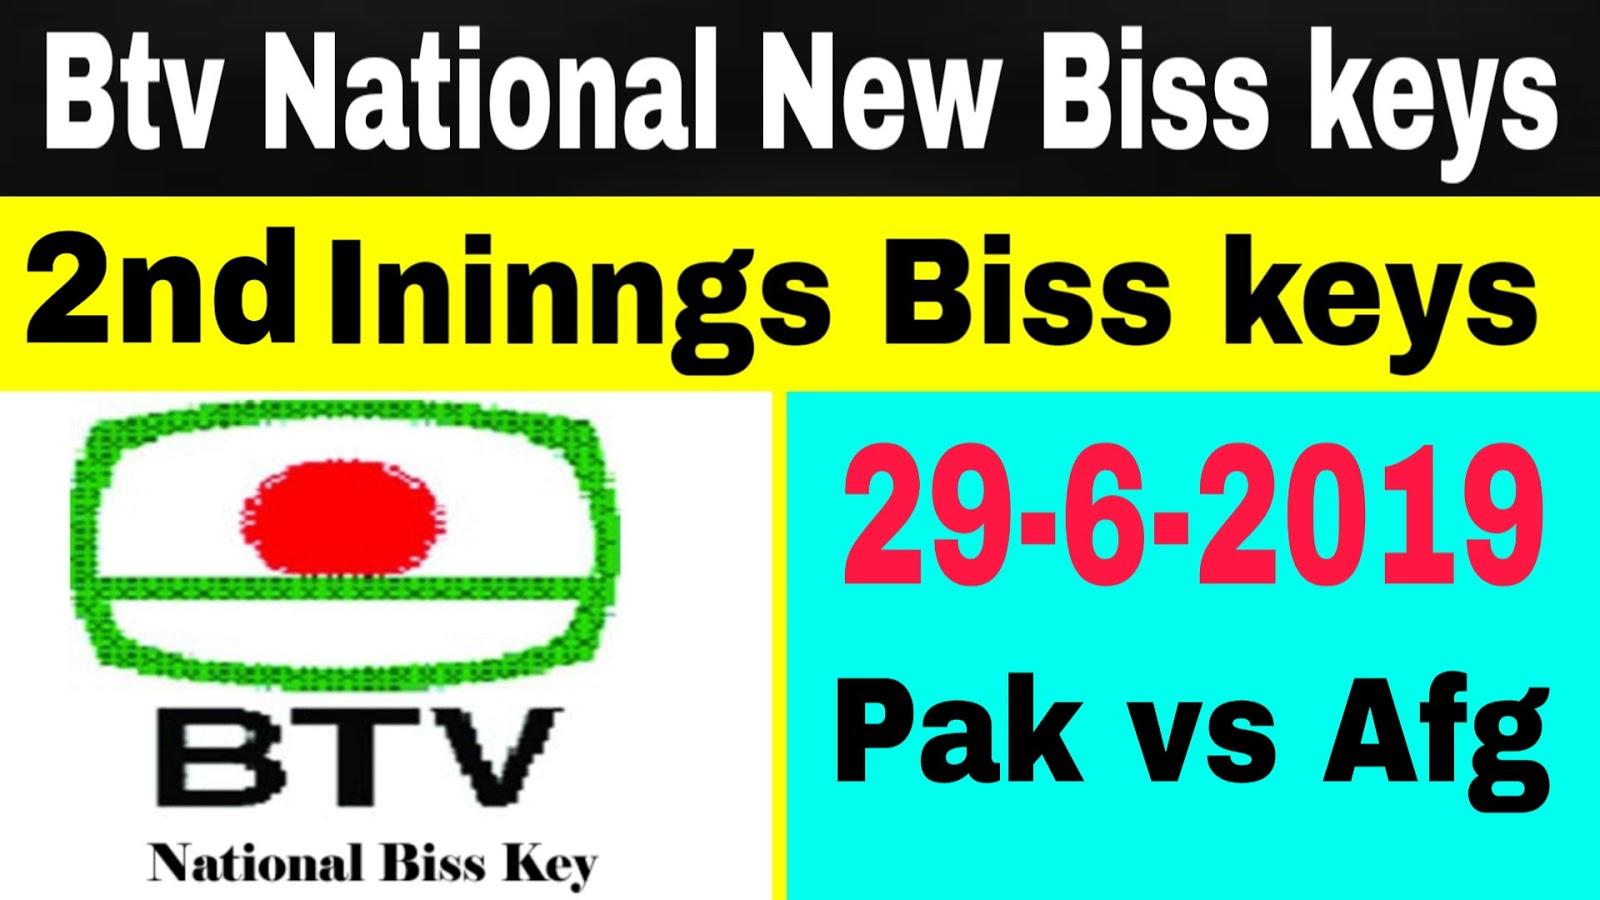 Btv National New Biss Keys 29 jun 2019 2nd Ininngs 06:30pm Pakistan